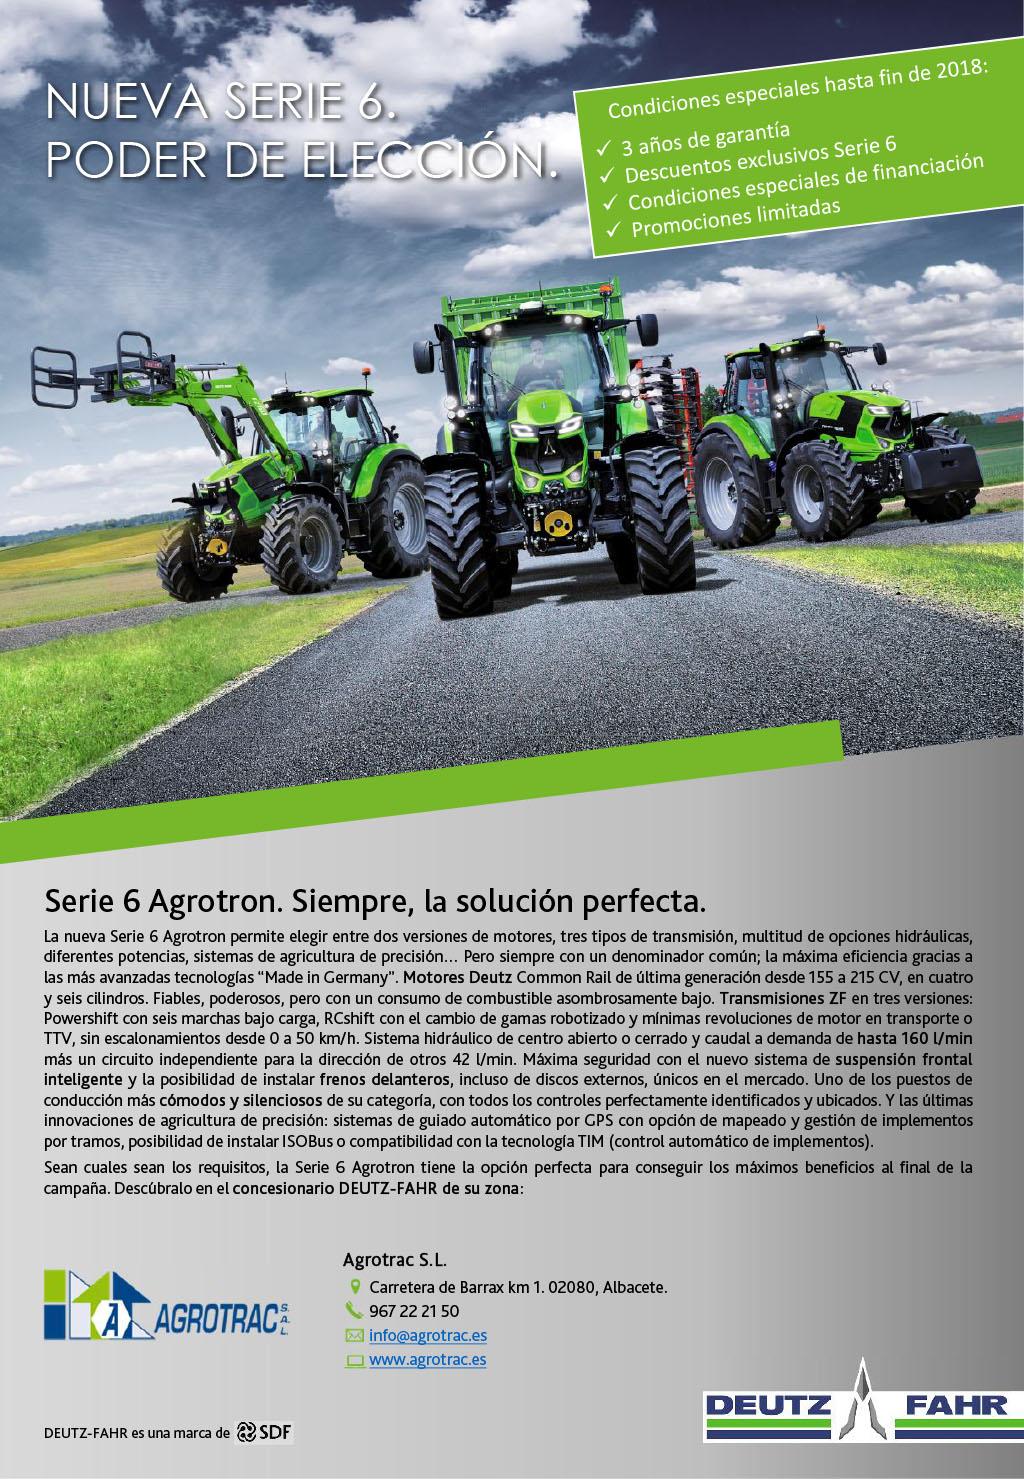 Serie 6 Agrotron. Siempre, la solución perfecta